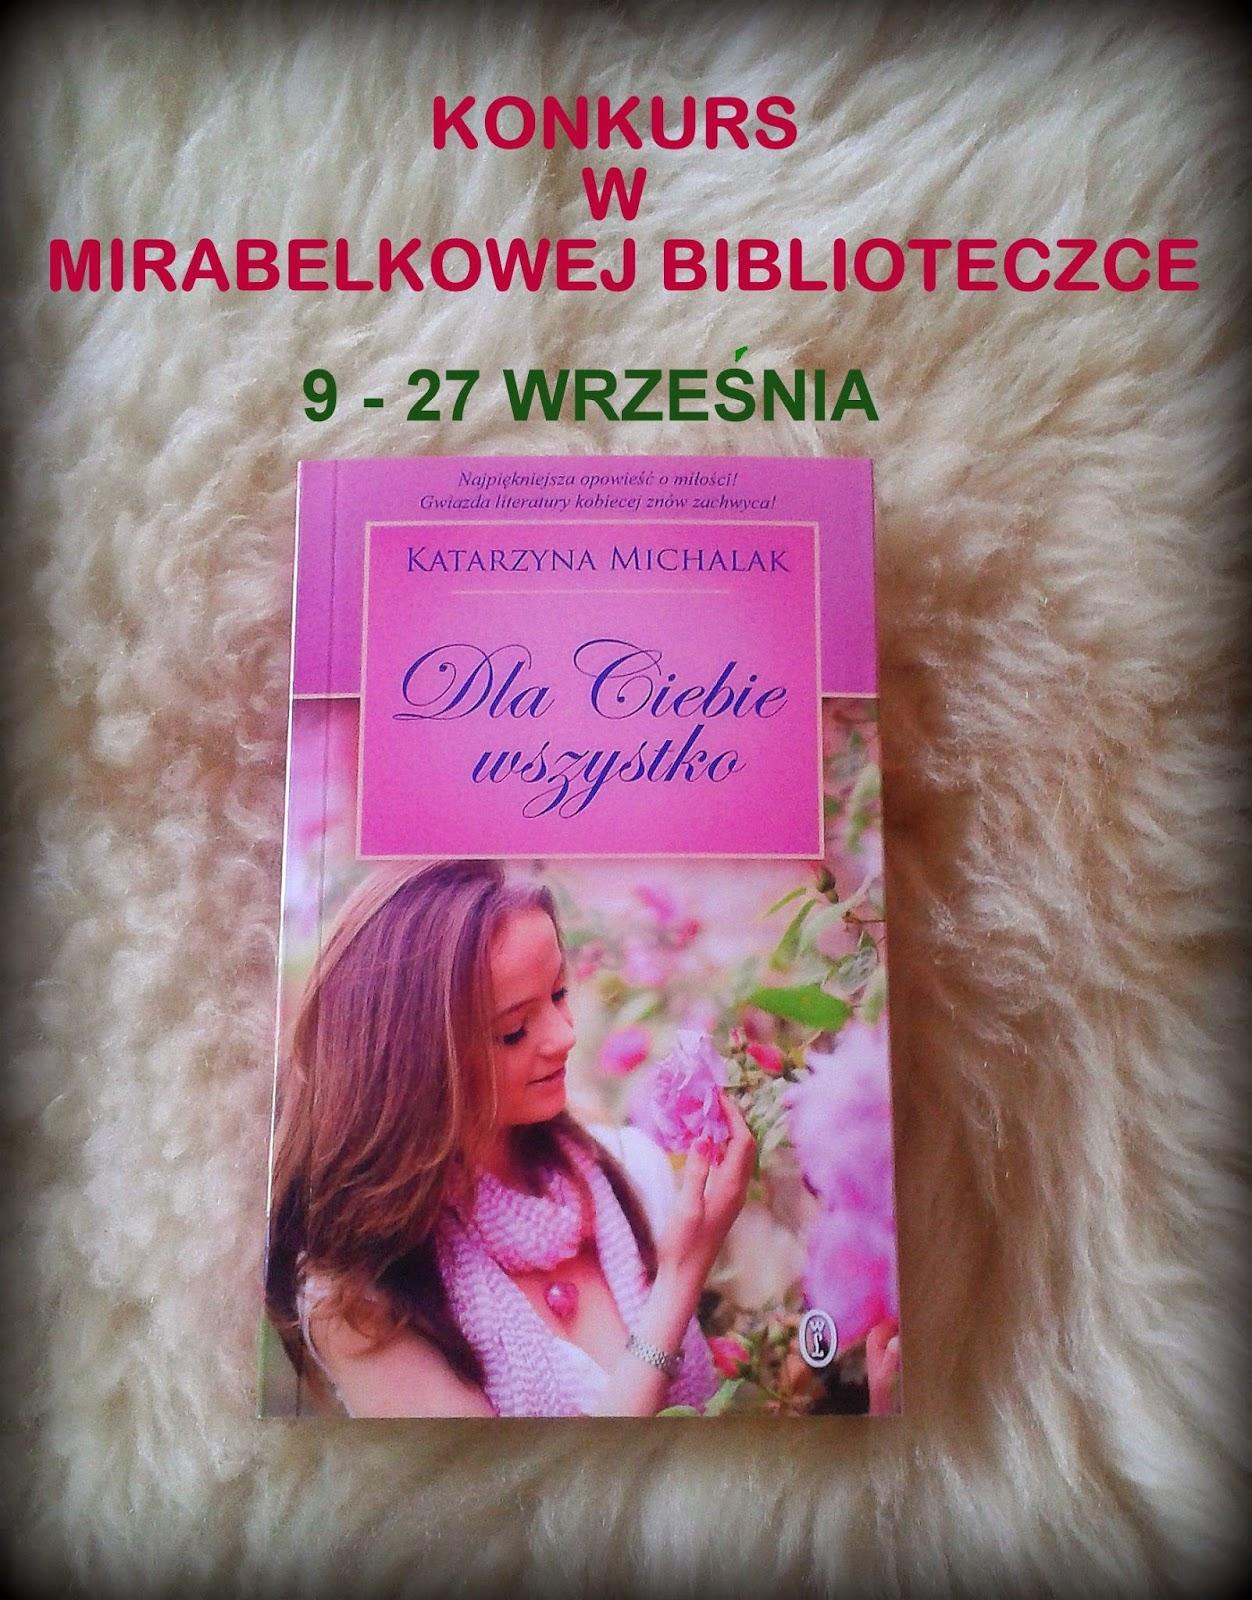 http://mirabelkowabiblioteczka.blogspot.com/2014/09/konkurs.html